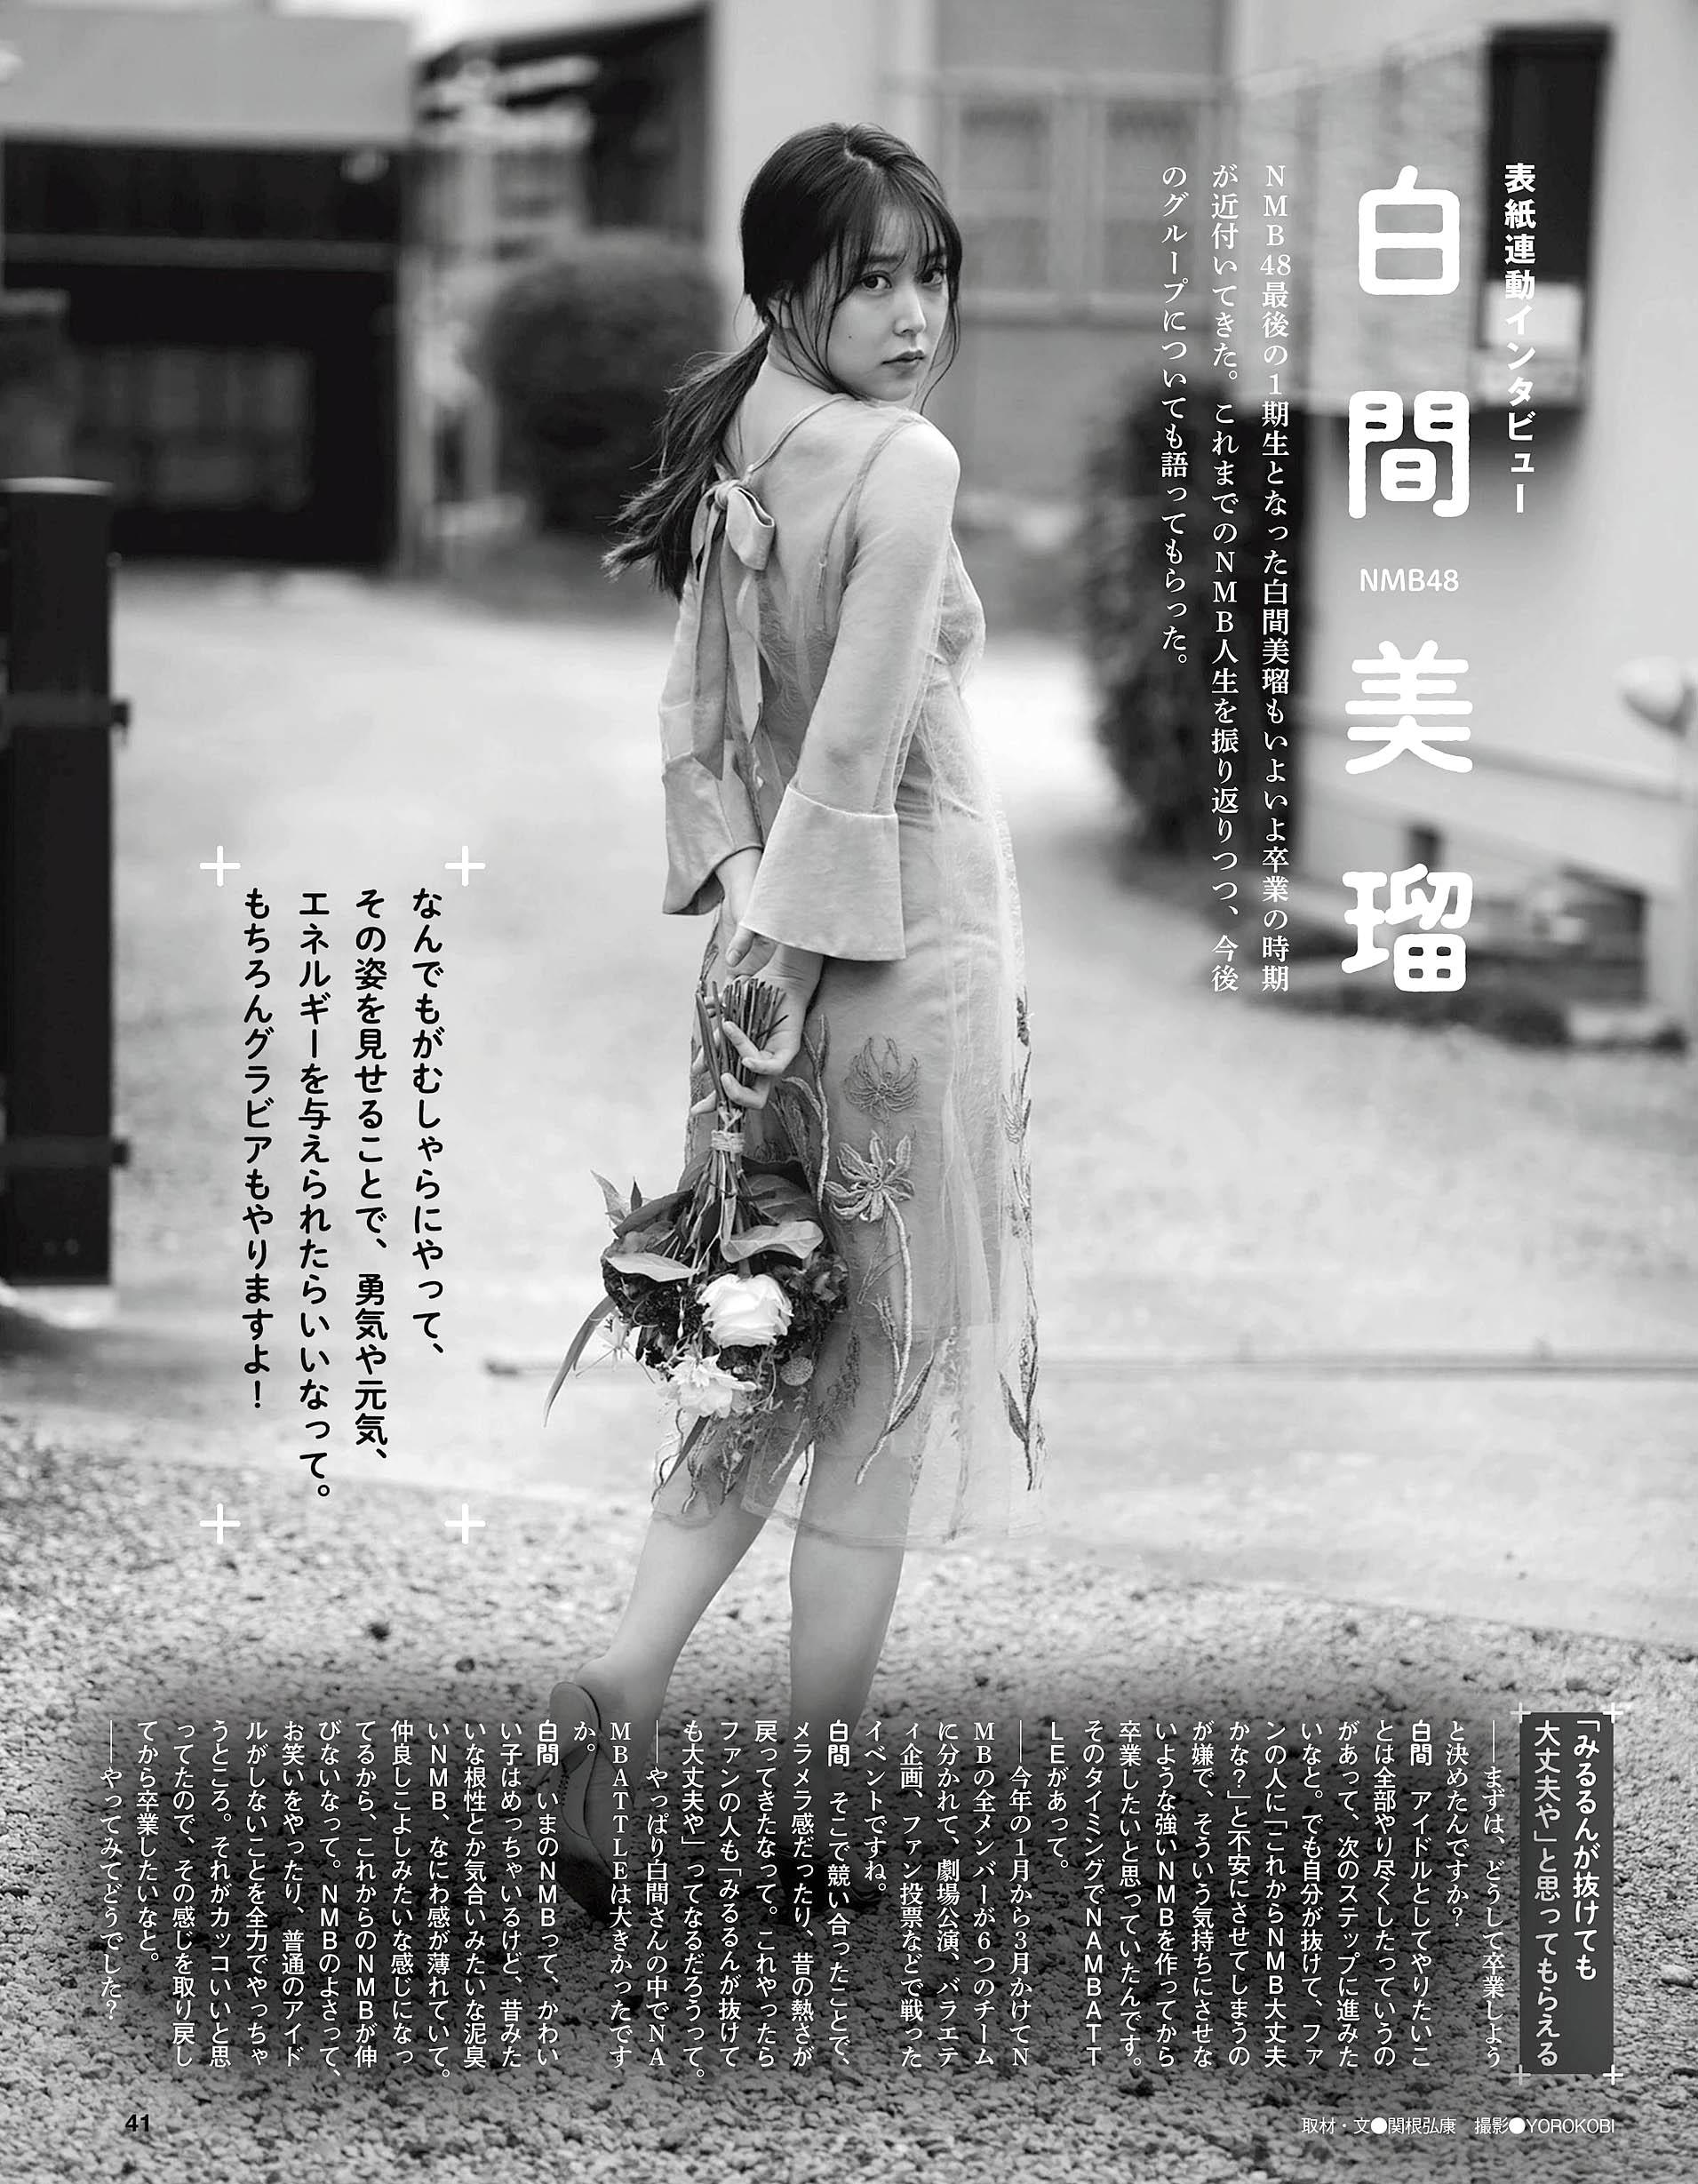 Miru Shiroma EX-Taishu 2106 10.jpg